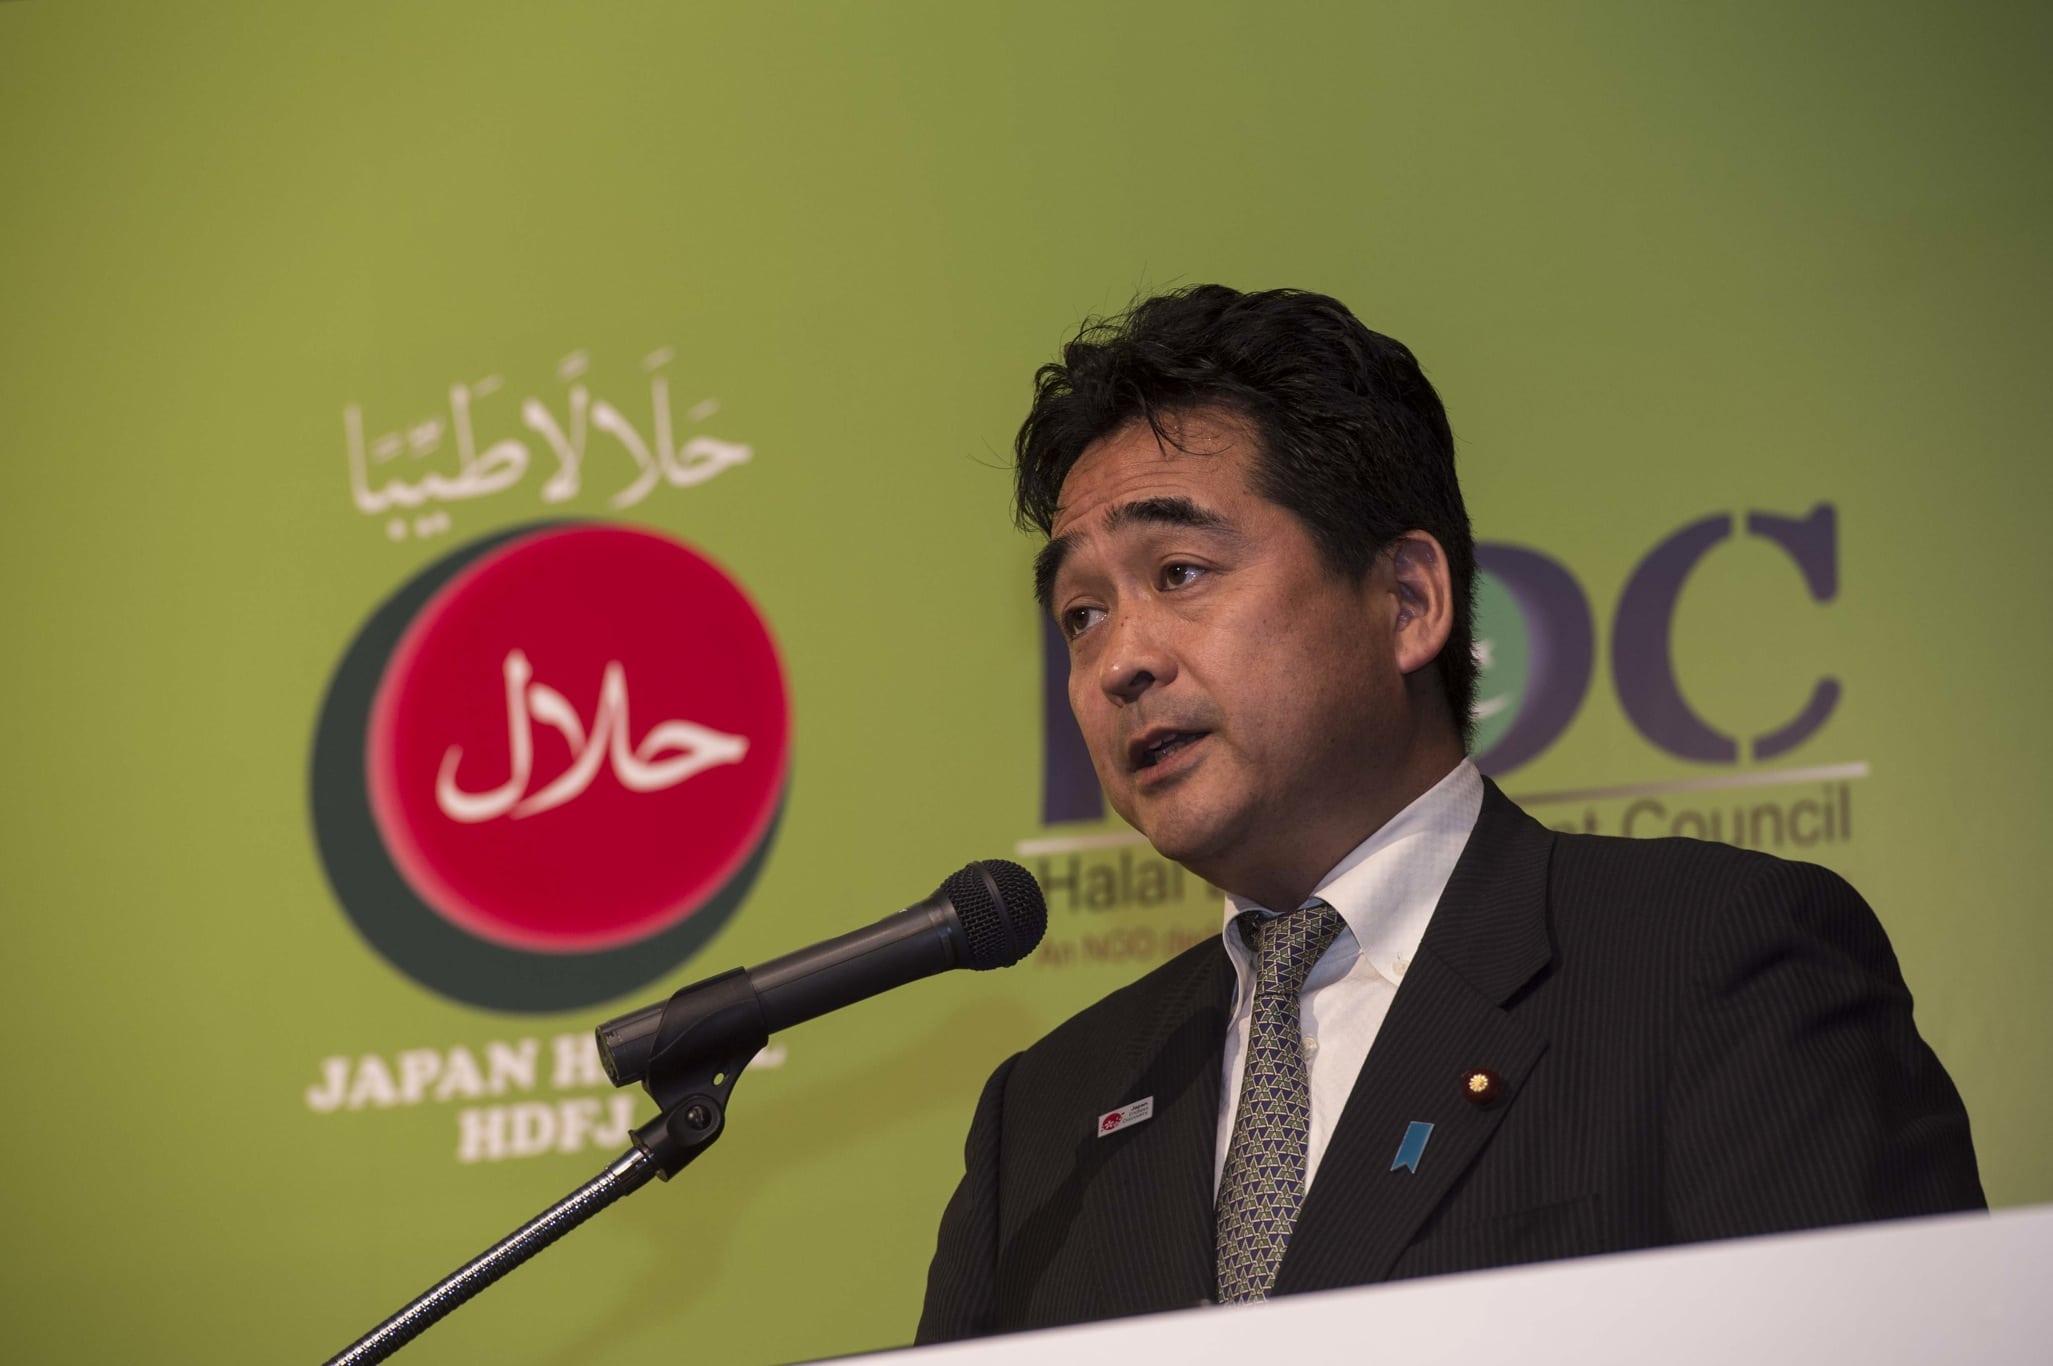 H.E Manabu Sakai